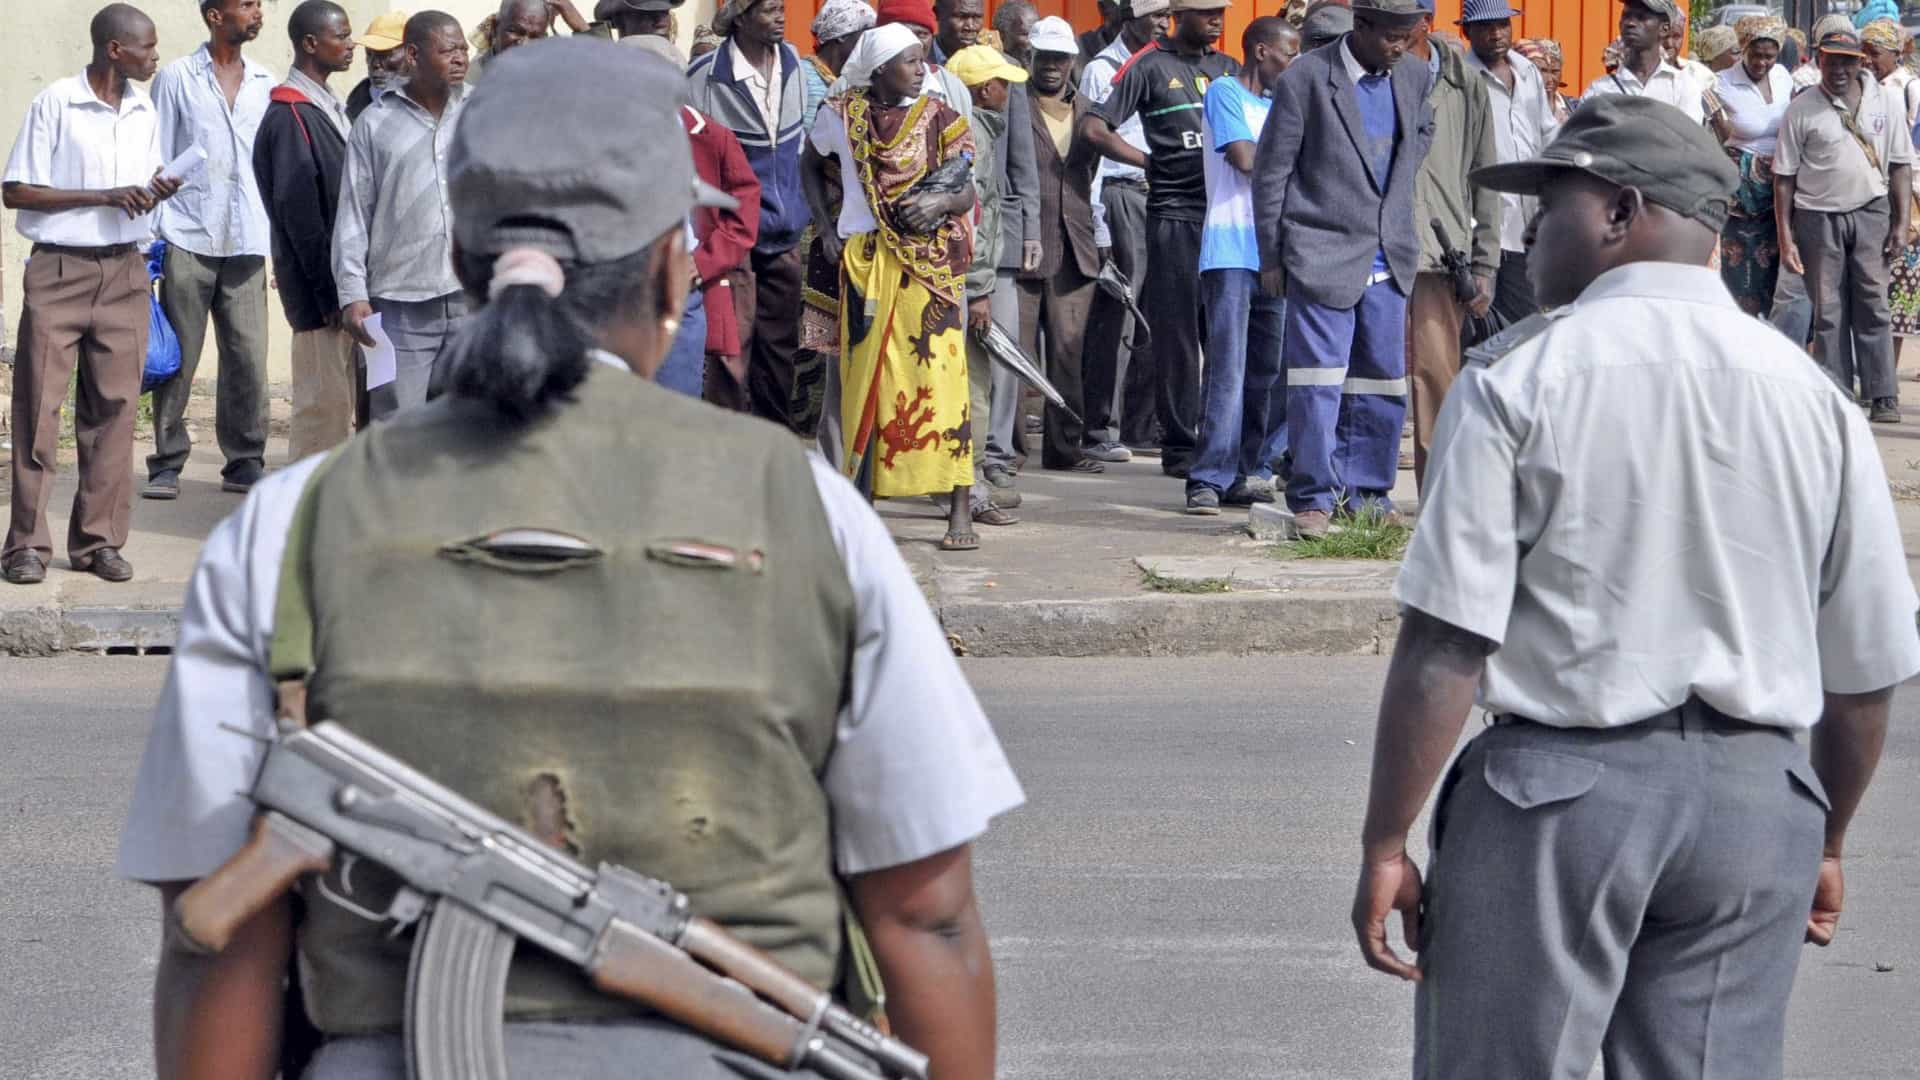 Polícia moçambicana detém mãe que envenenou filha após promover abusos